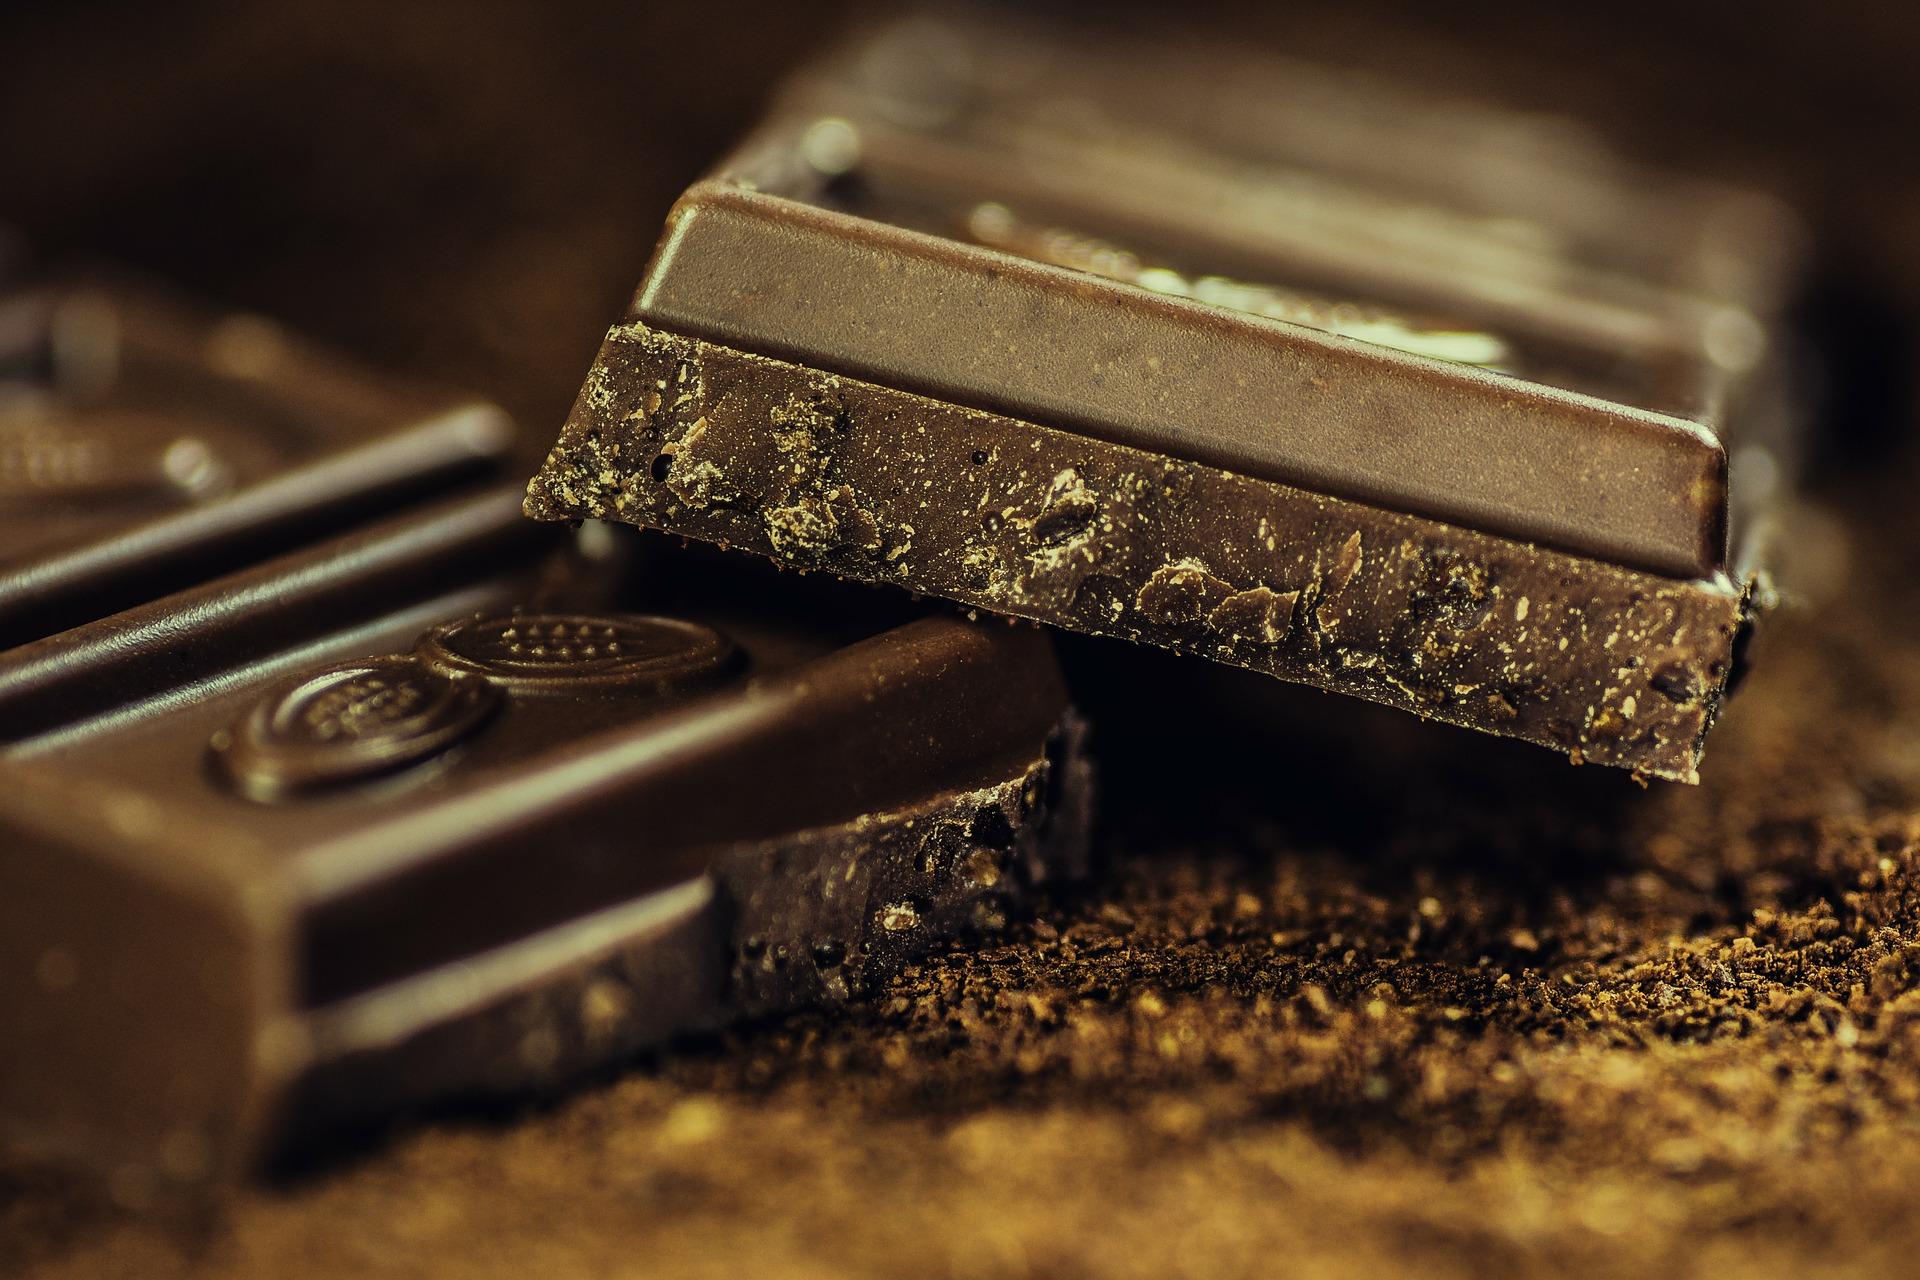 6816-cokolada.jpg